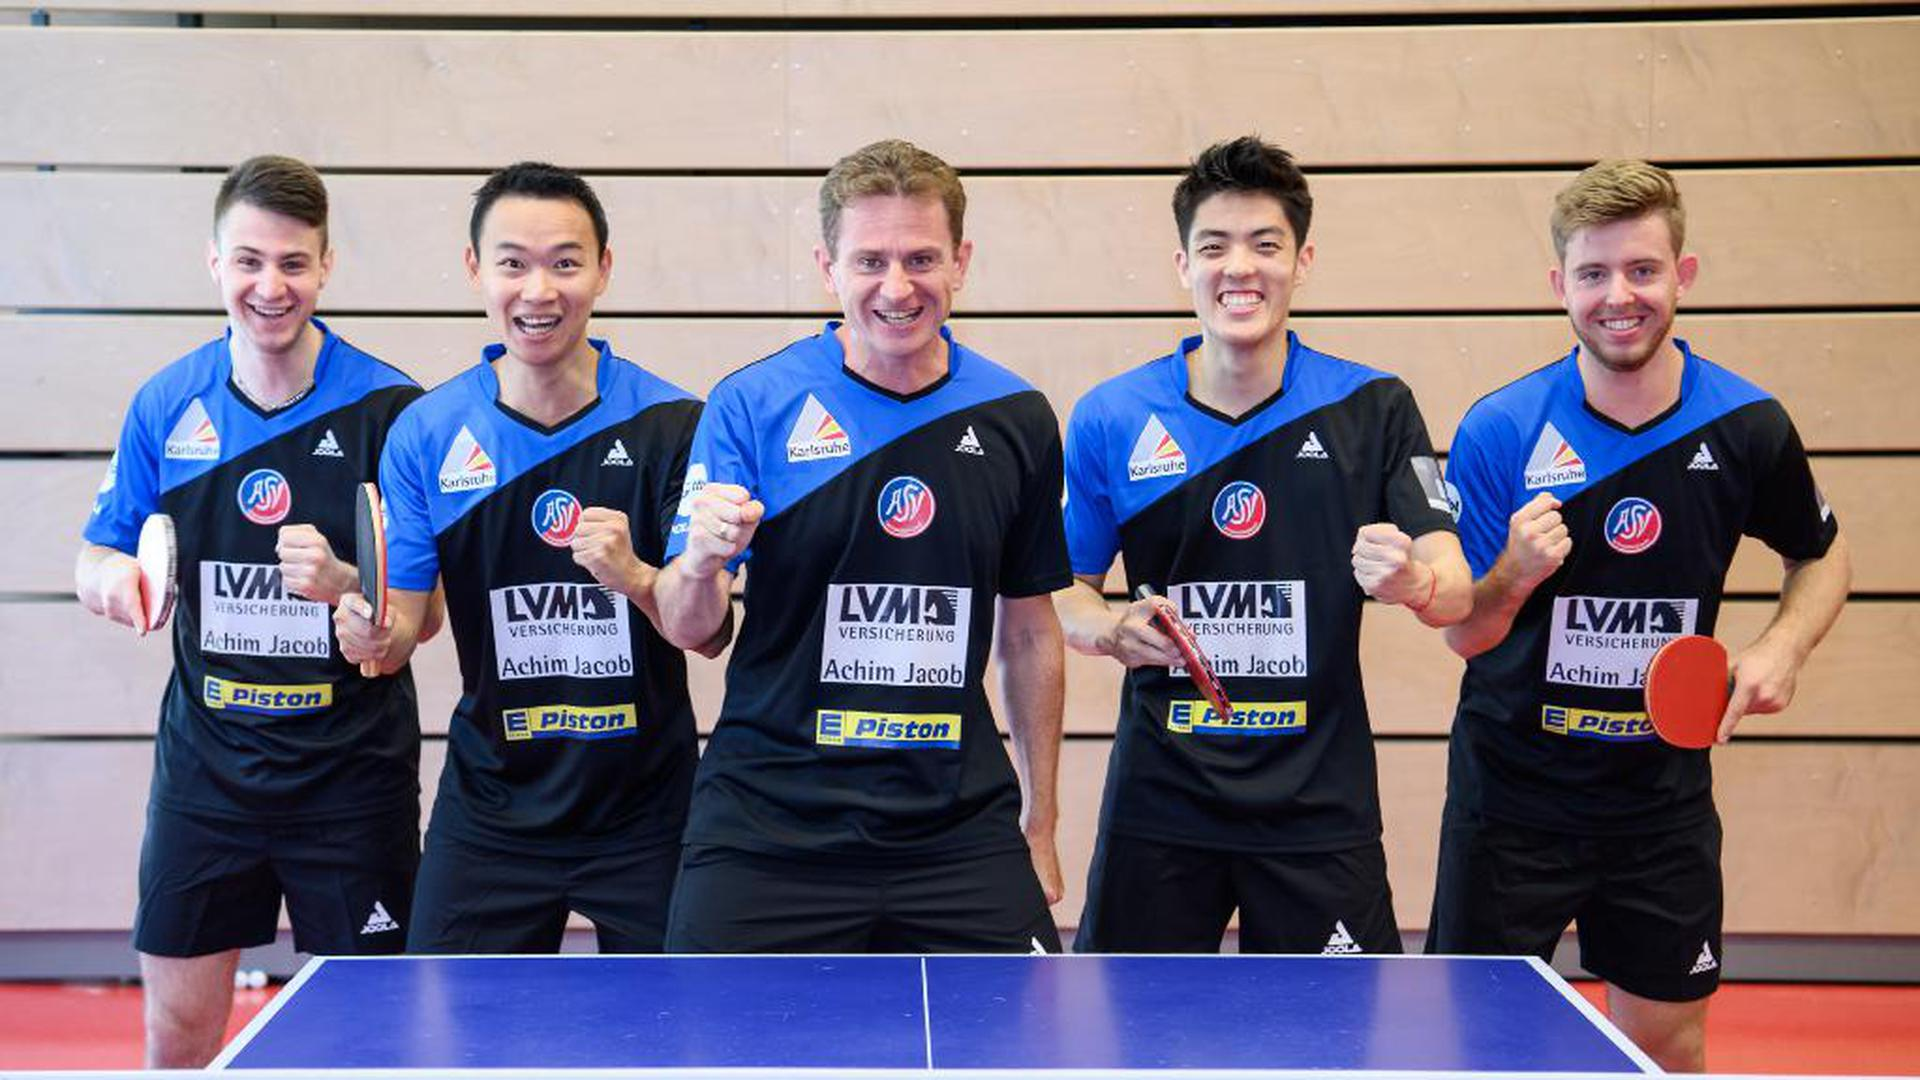 Mannschaftsfoto: Deni Kozul, Wang Xi, Trainer Joachim Sekinger, Dang Qiu, Tobias Rasmussen (Gruenwettersbach) (von links).  GES/ Tischtennis/ 1. Bundesliga: ASV Gruenwettersbach - Mannschaftsfototermin, 15.08.2020 --